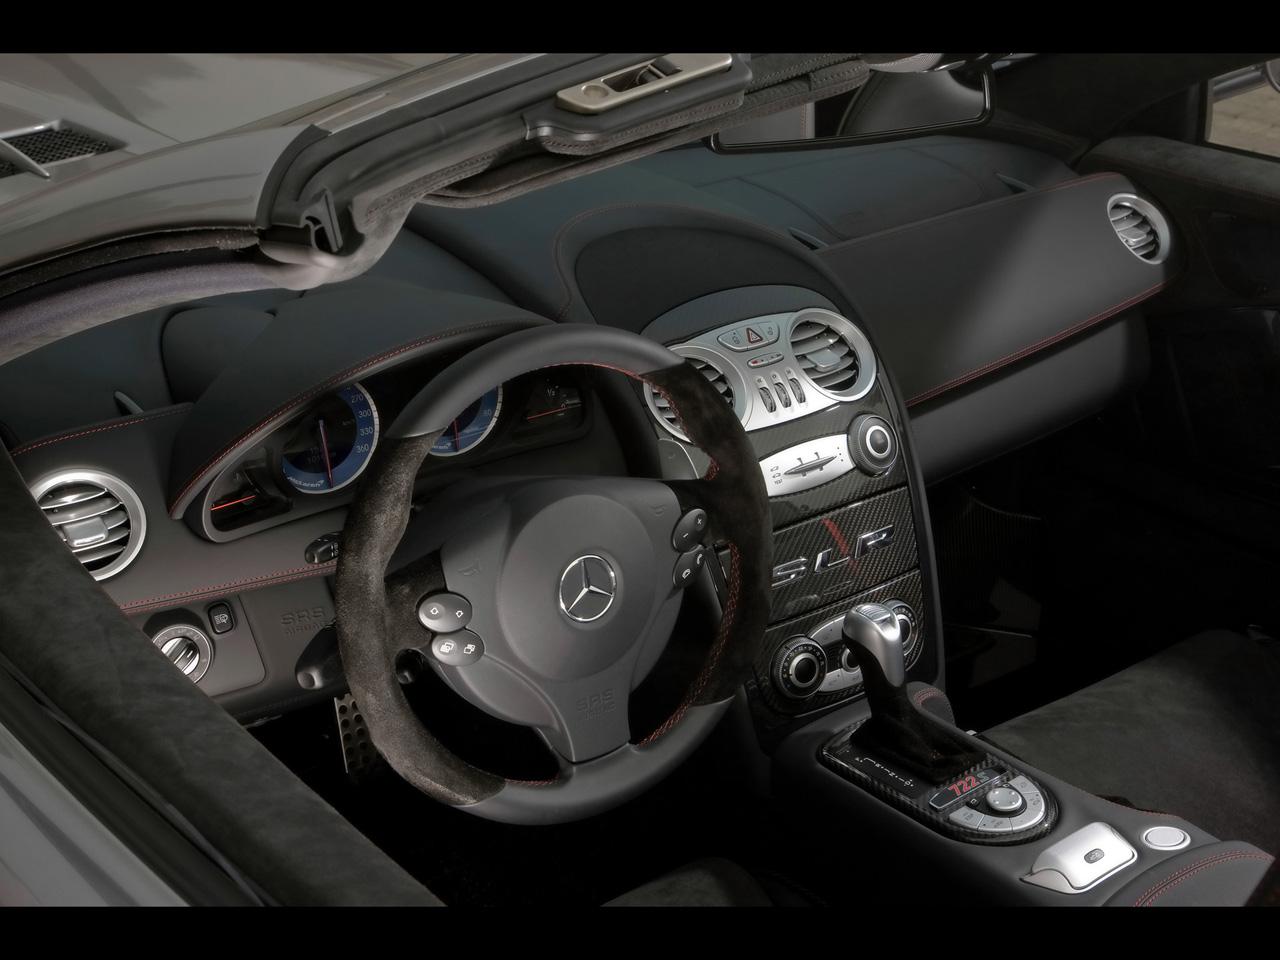 2009-Mercedes-Benz-SLR-McLaren-Roadster-722-S-Dashboard-Top-1280x960.jpg